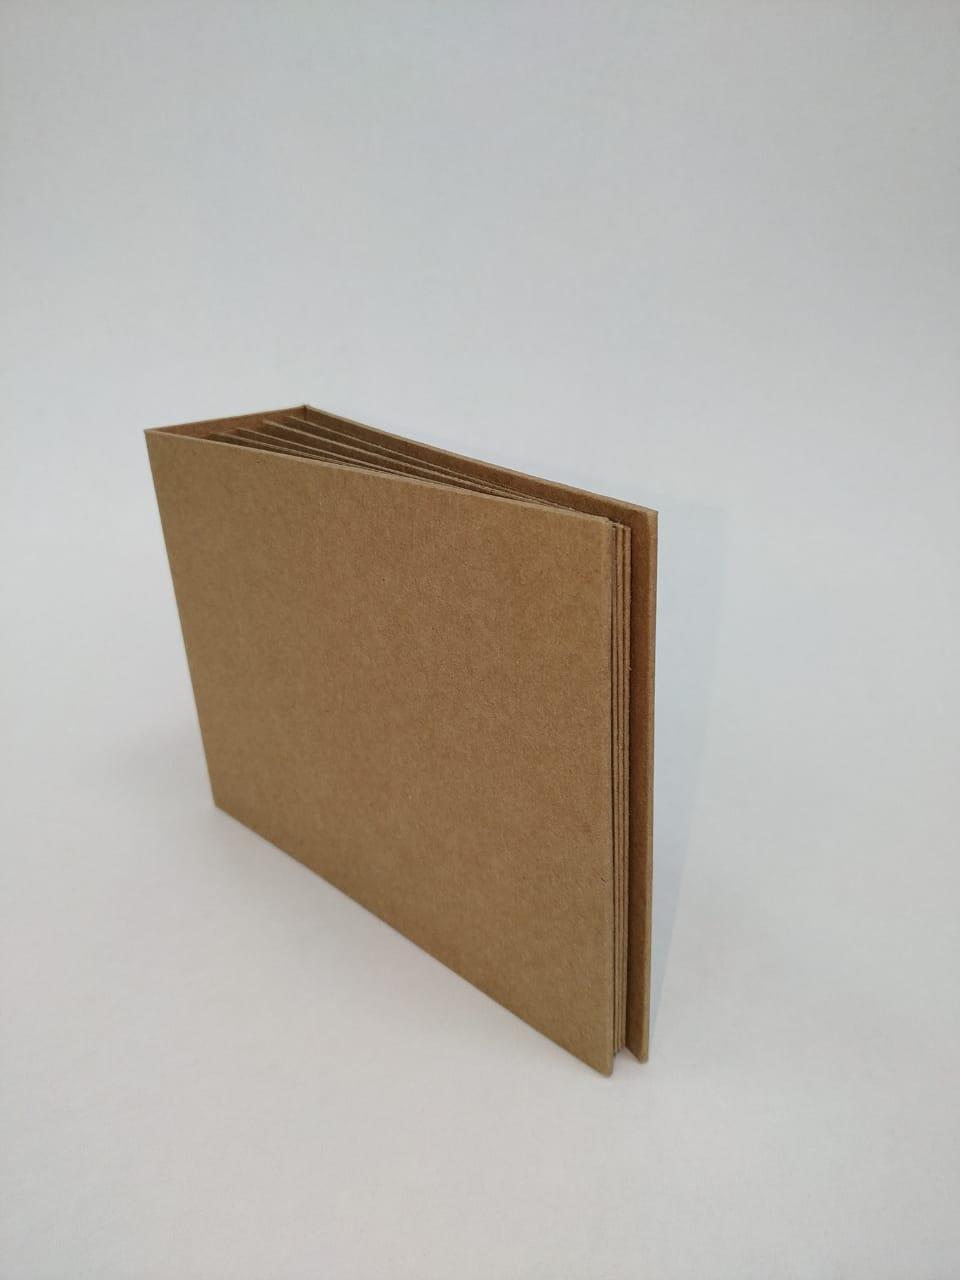 Álbum 12 x 17 com lombada Kraft - JuJu Scrapbook  - JuJu Scrapbook